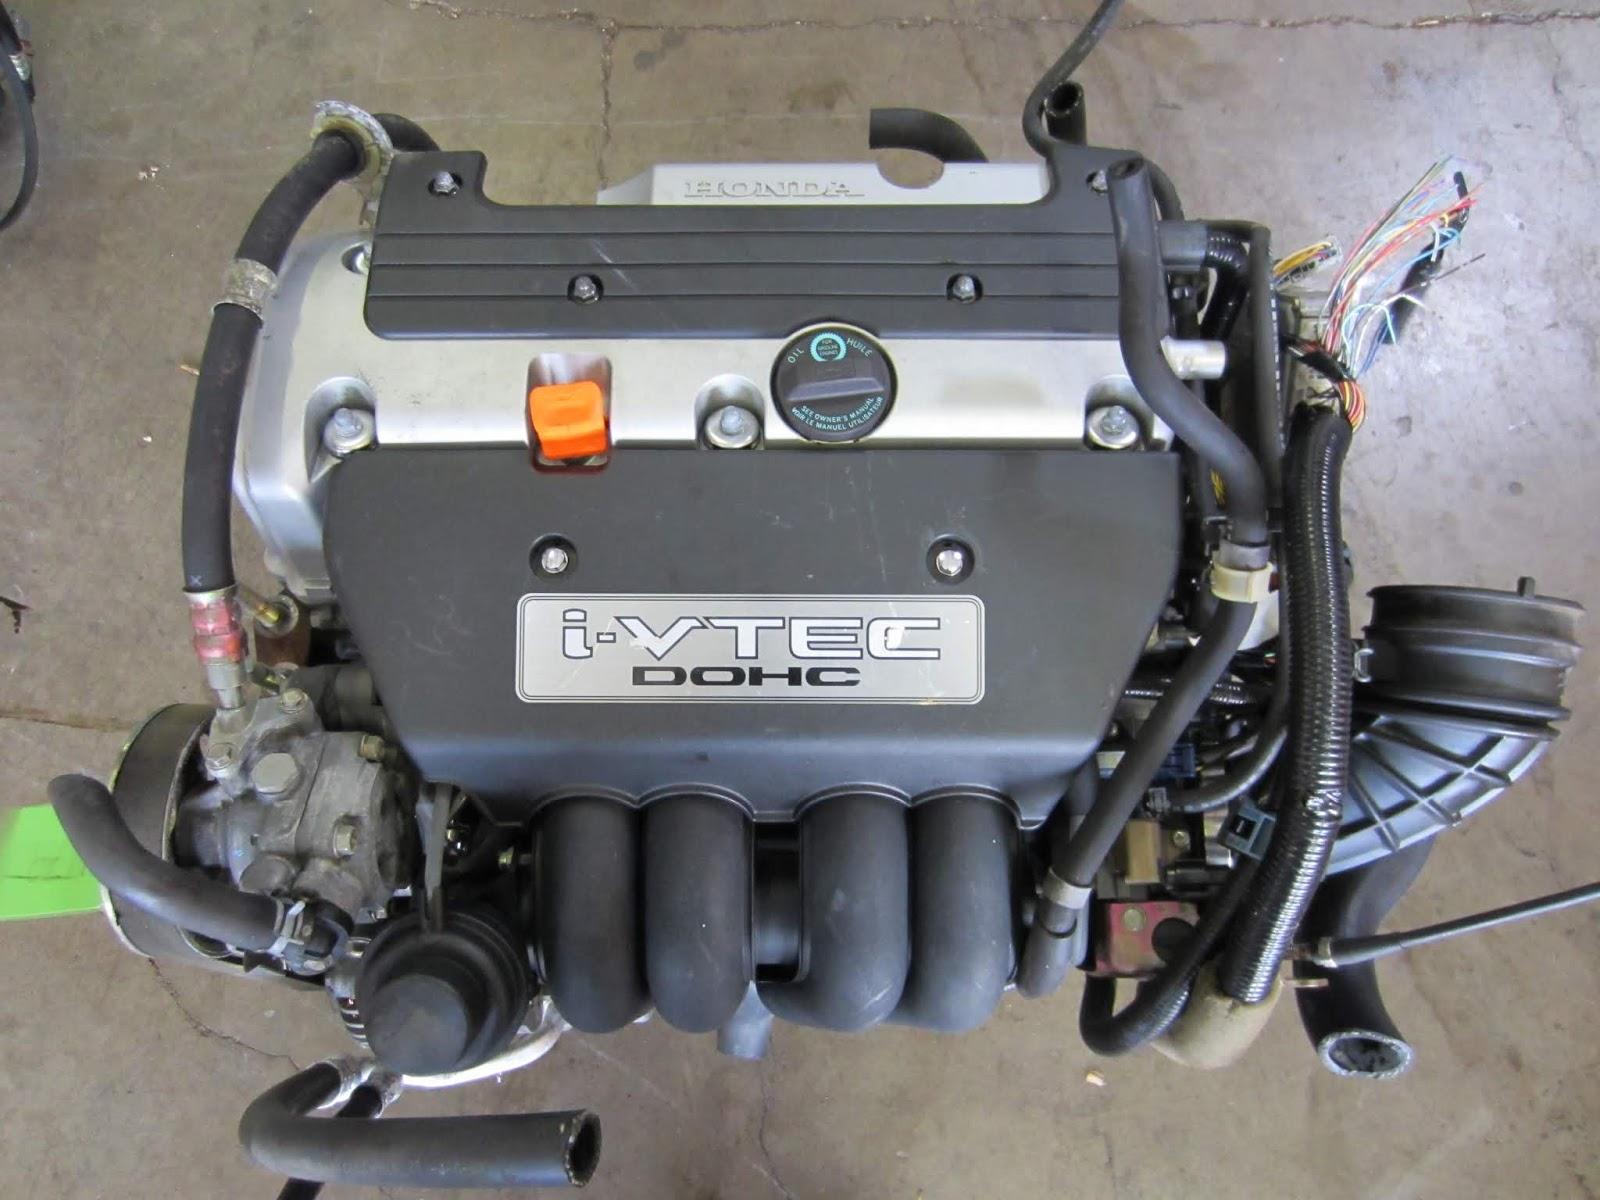 v7 Τι είναι το Vtec της Honda. Η ιστορία του Honda, Honda Civic, Honda Civic Type R, Honda S2000, iVtec, τεχνικά, Τεχνολογία